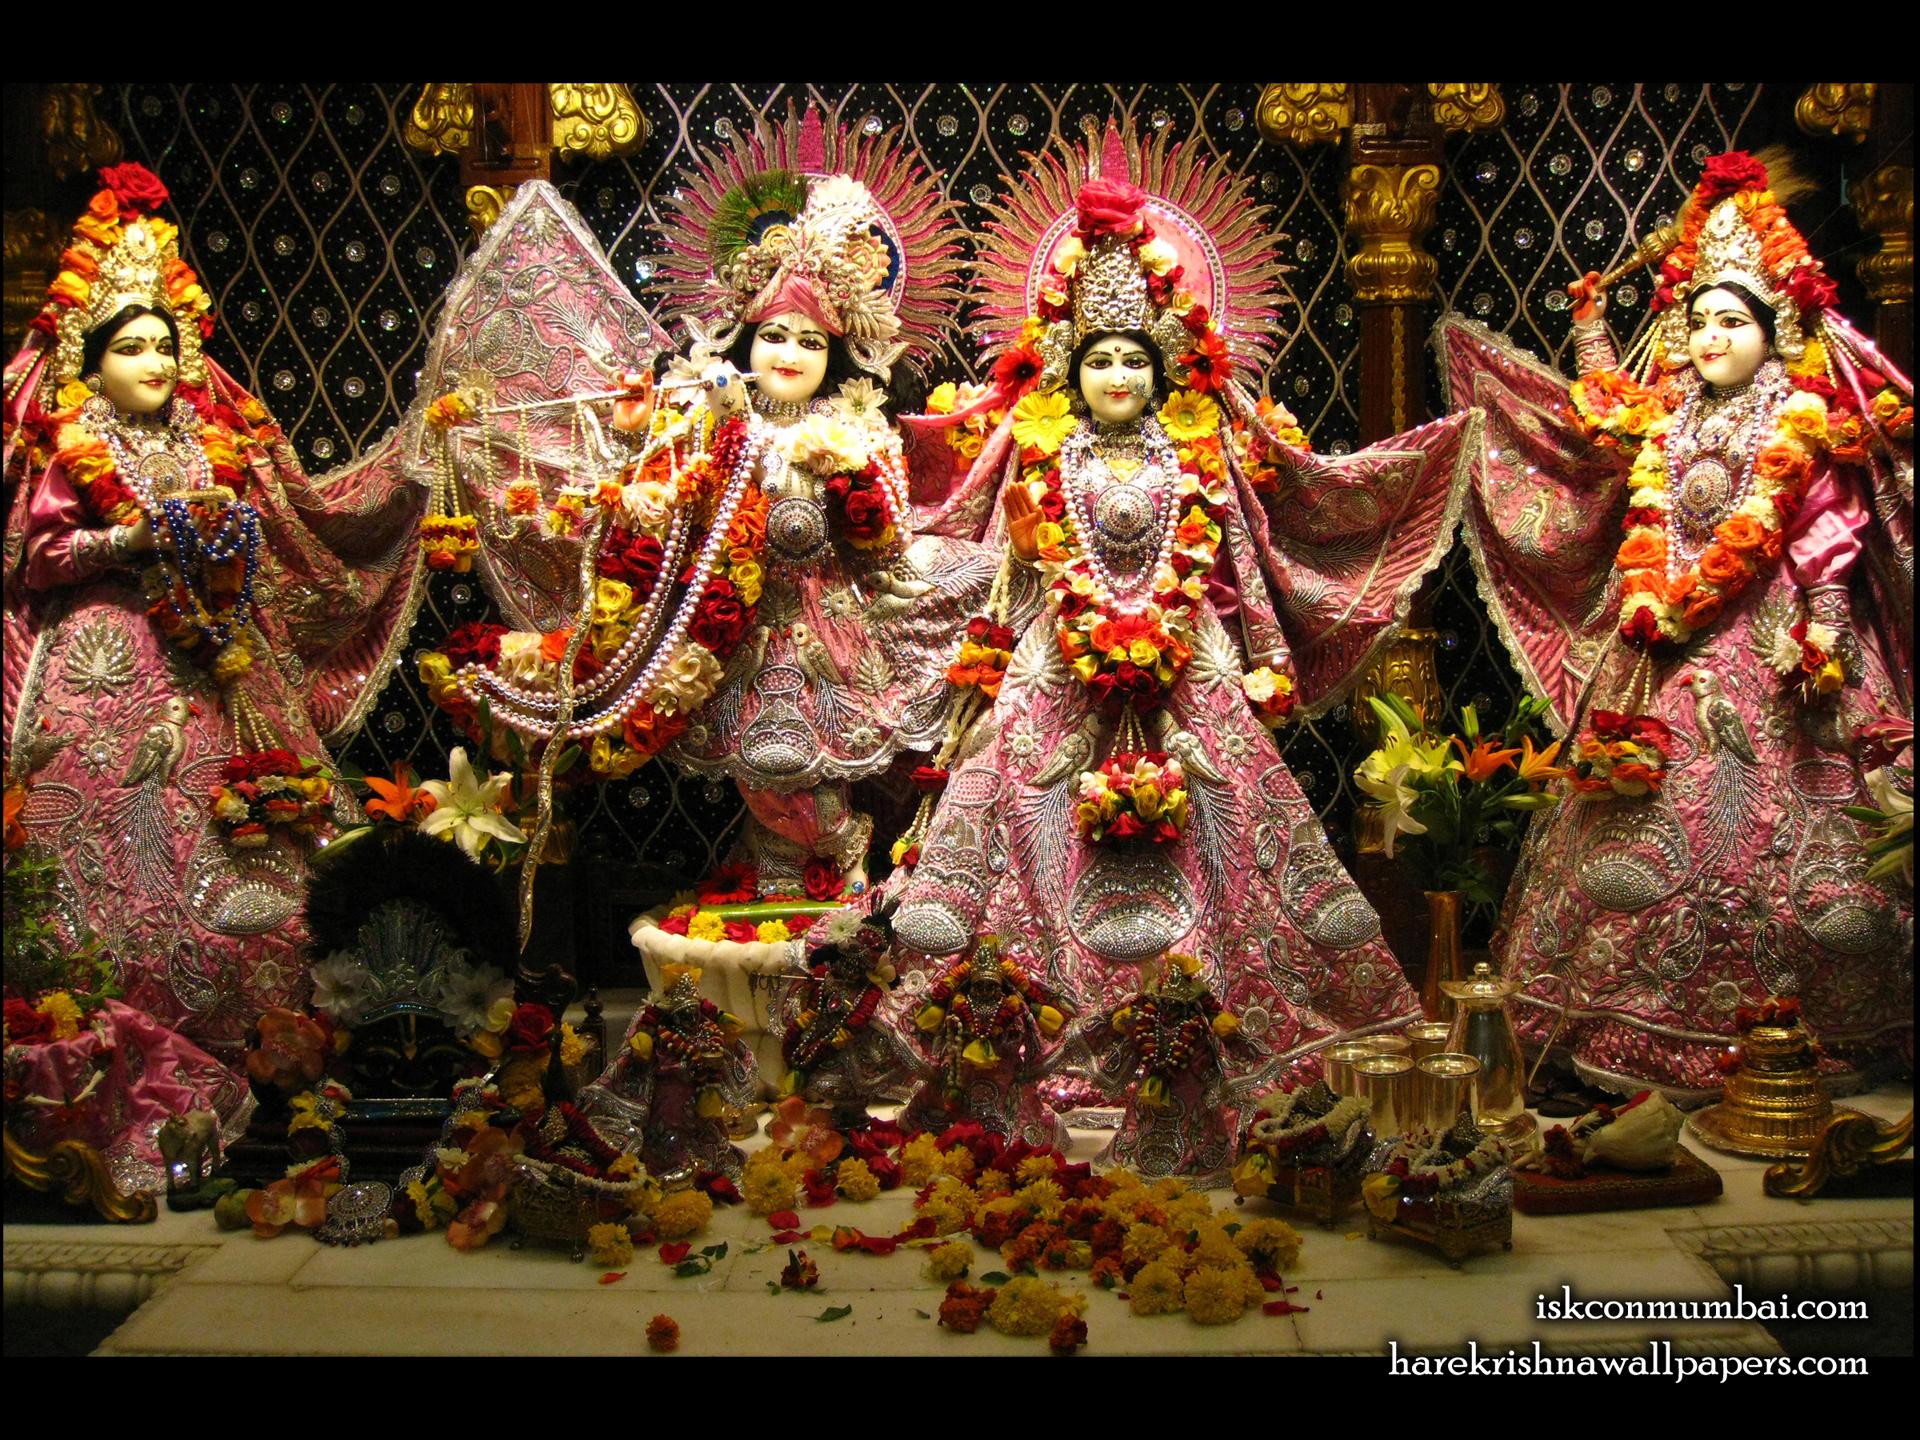 Sri Sri Radha Rasabihari Lalita Vishakha Wallpaper (008) Size 1920x1440 Download